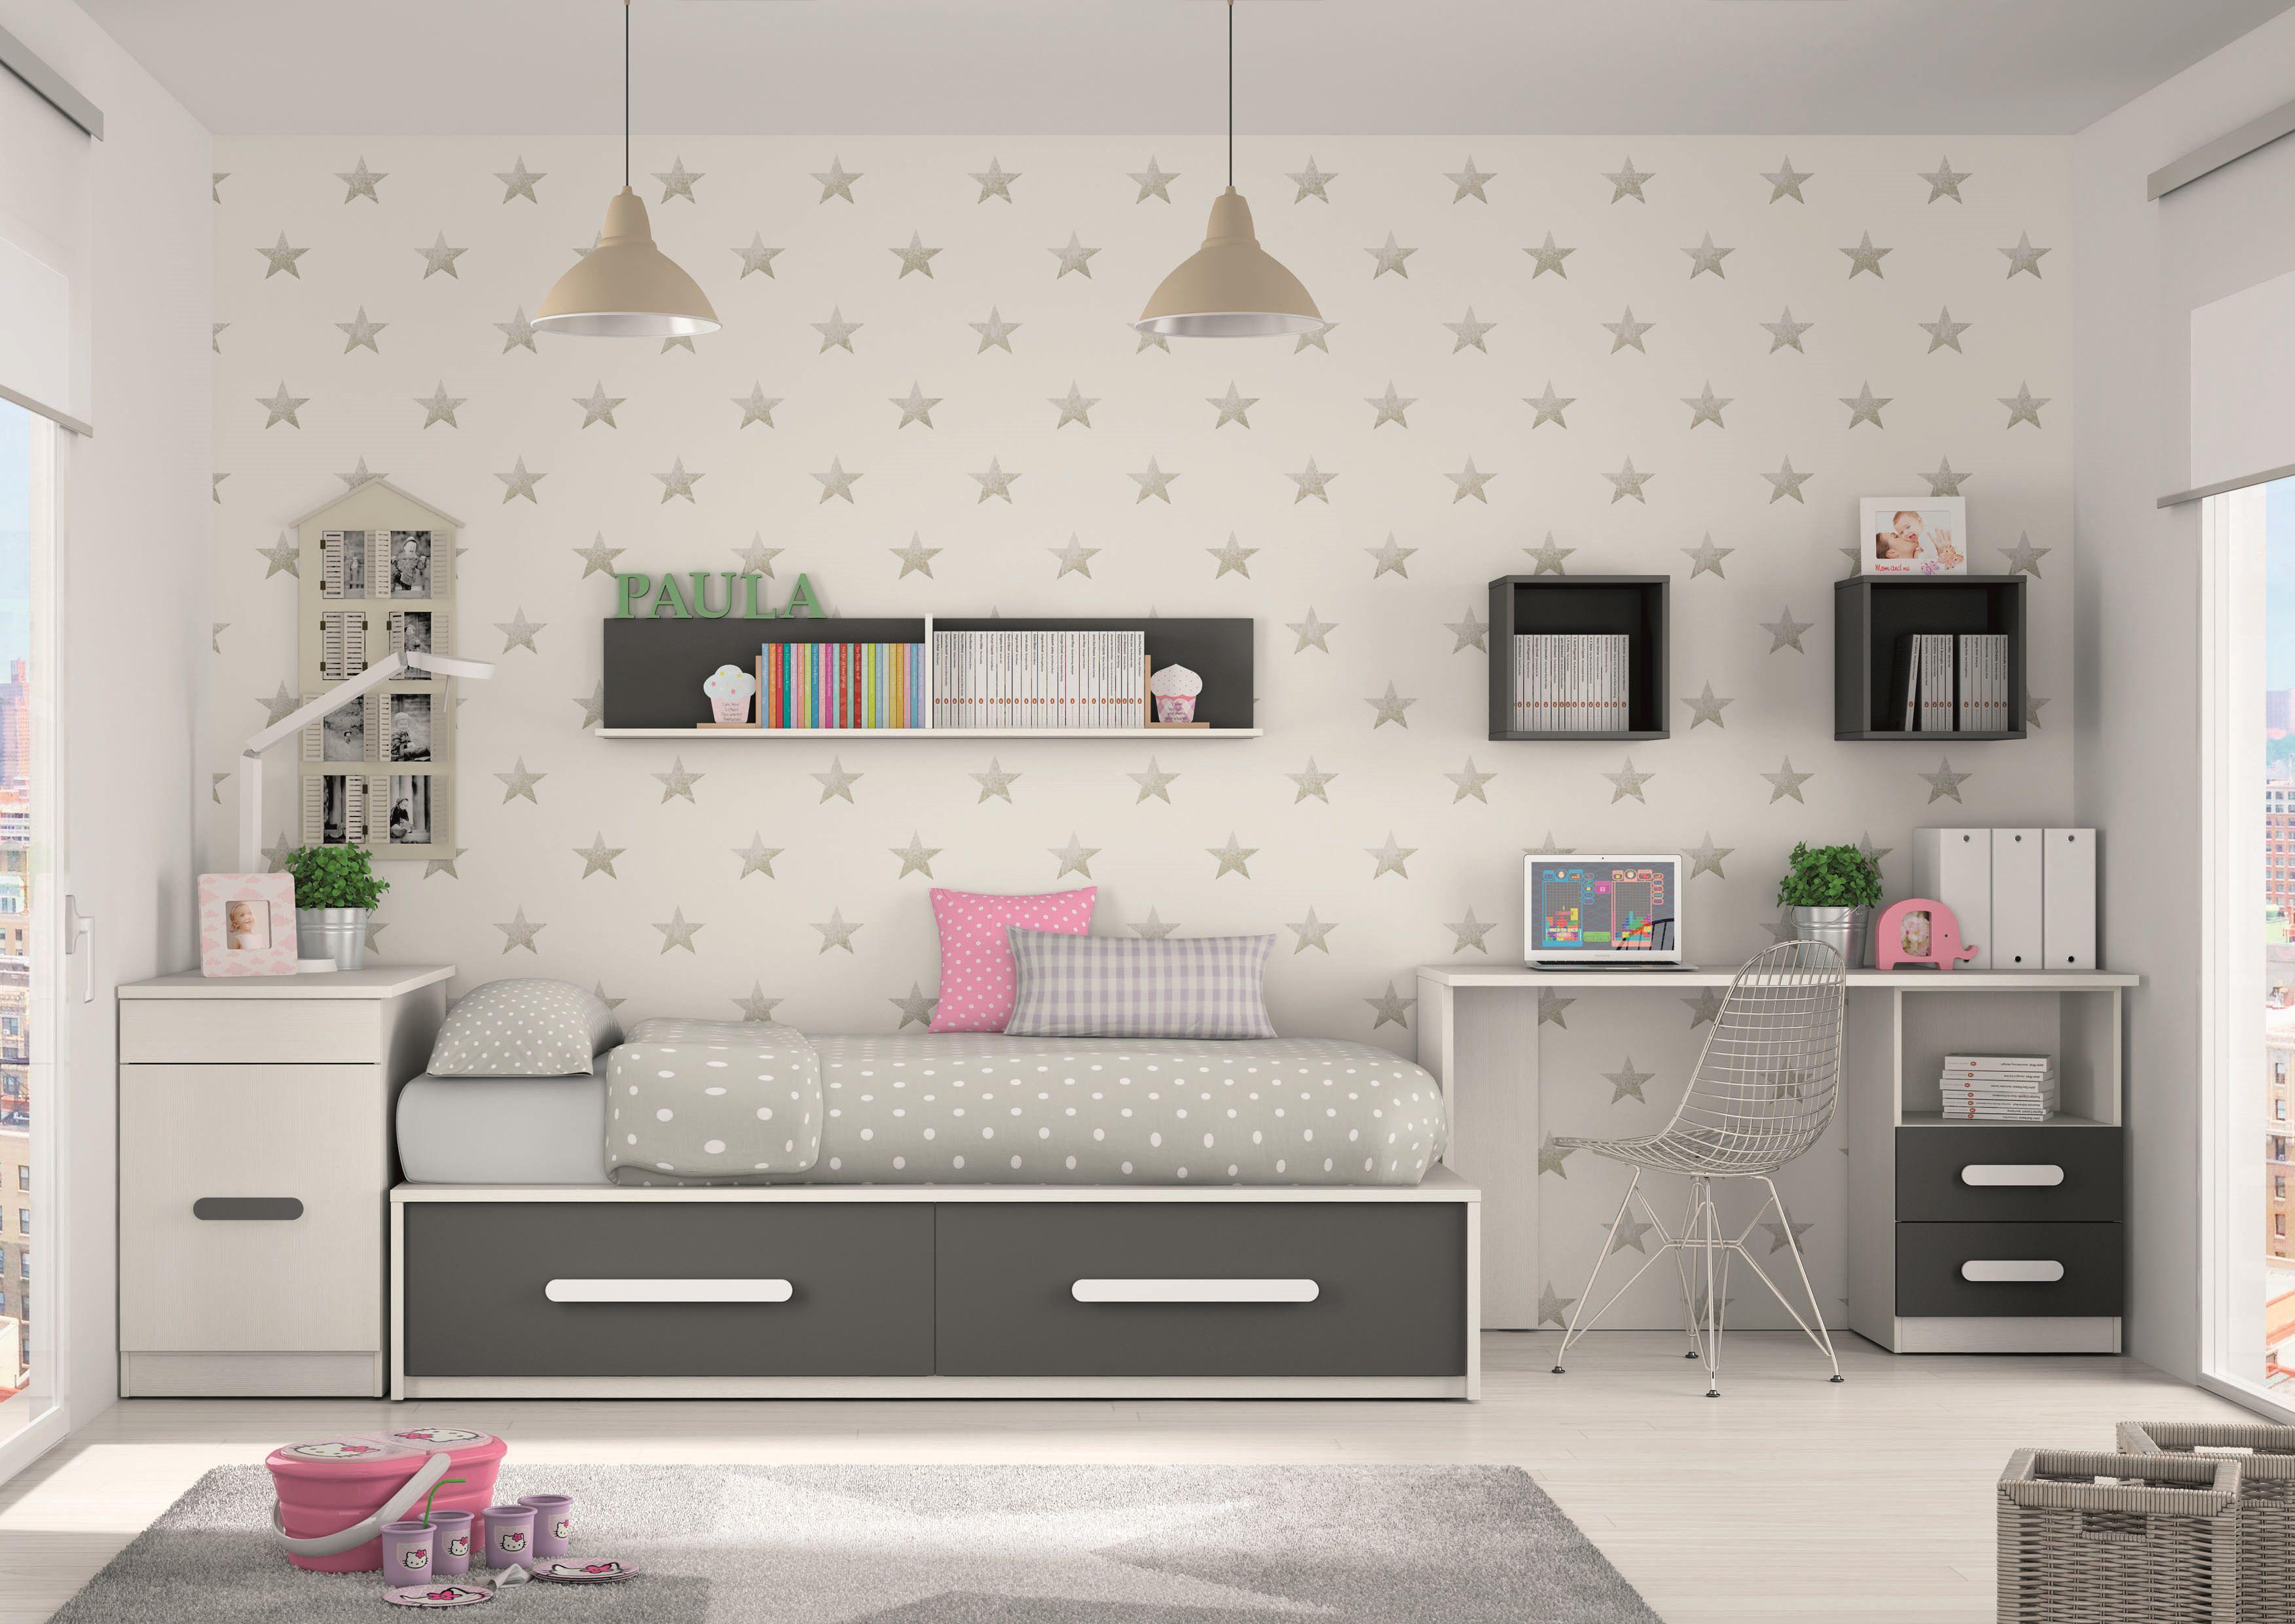 Muebles juveniles algunas ideas crea espai for Muebles juveniles baratos